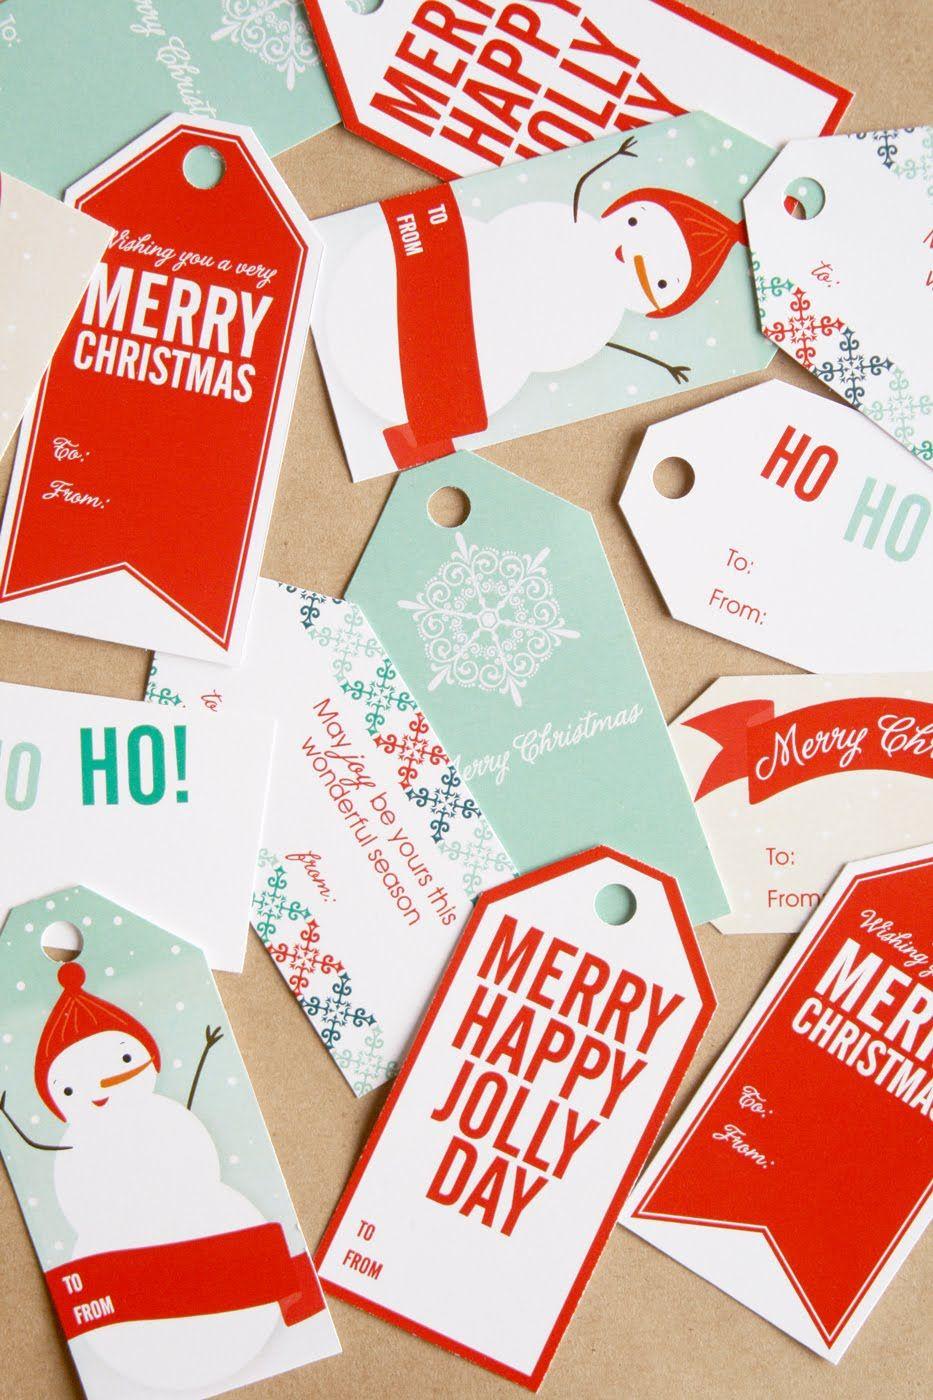 Free printable gift tags httpdosgraysonmufnincfreestuff free printable gift tags httpdosgraysonmufnincfreestuff negle Choice Image